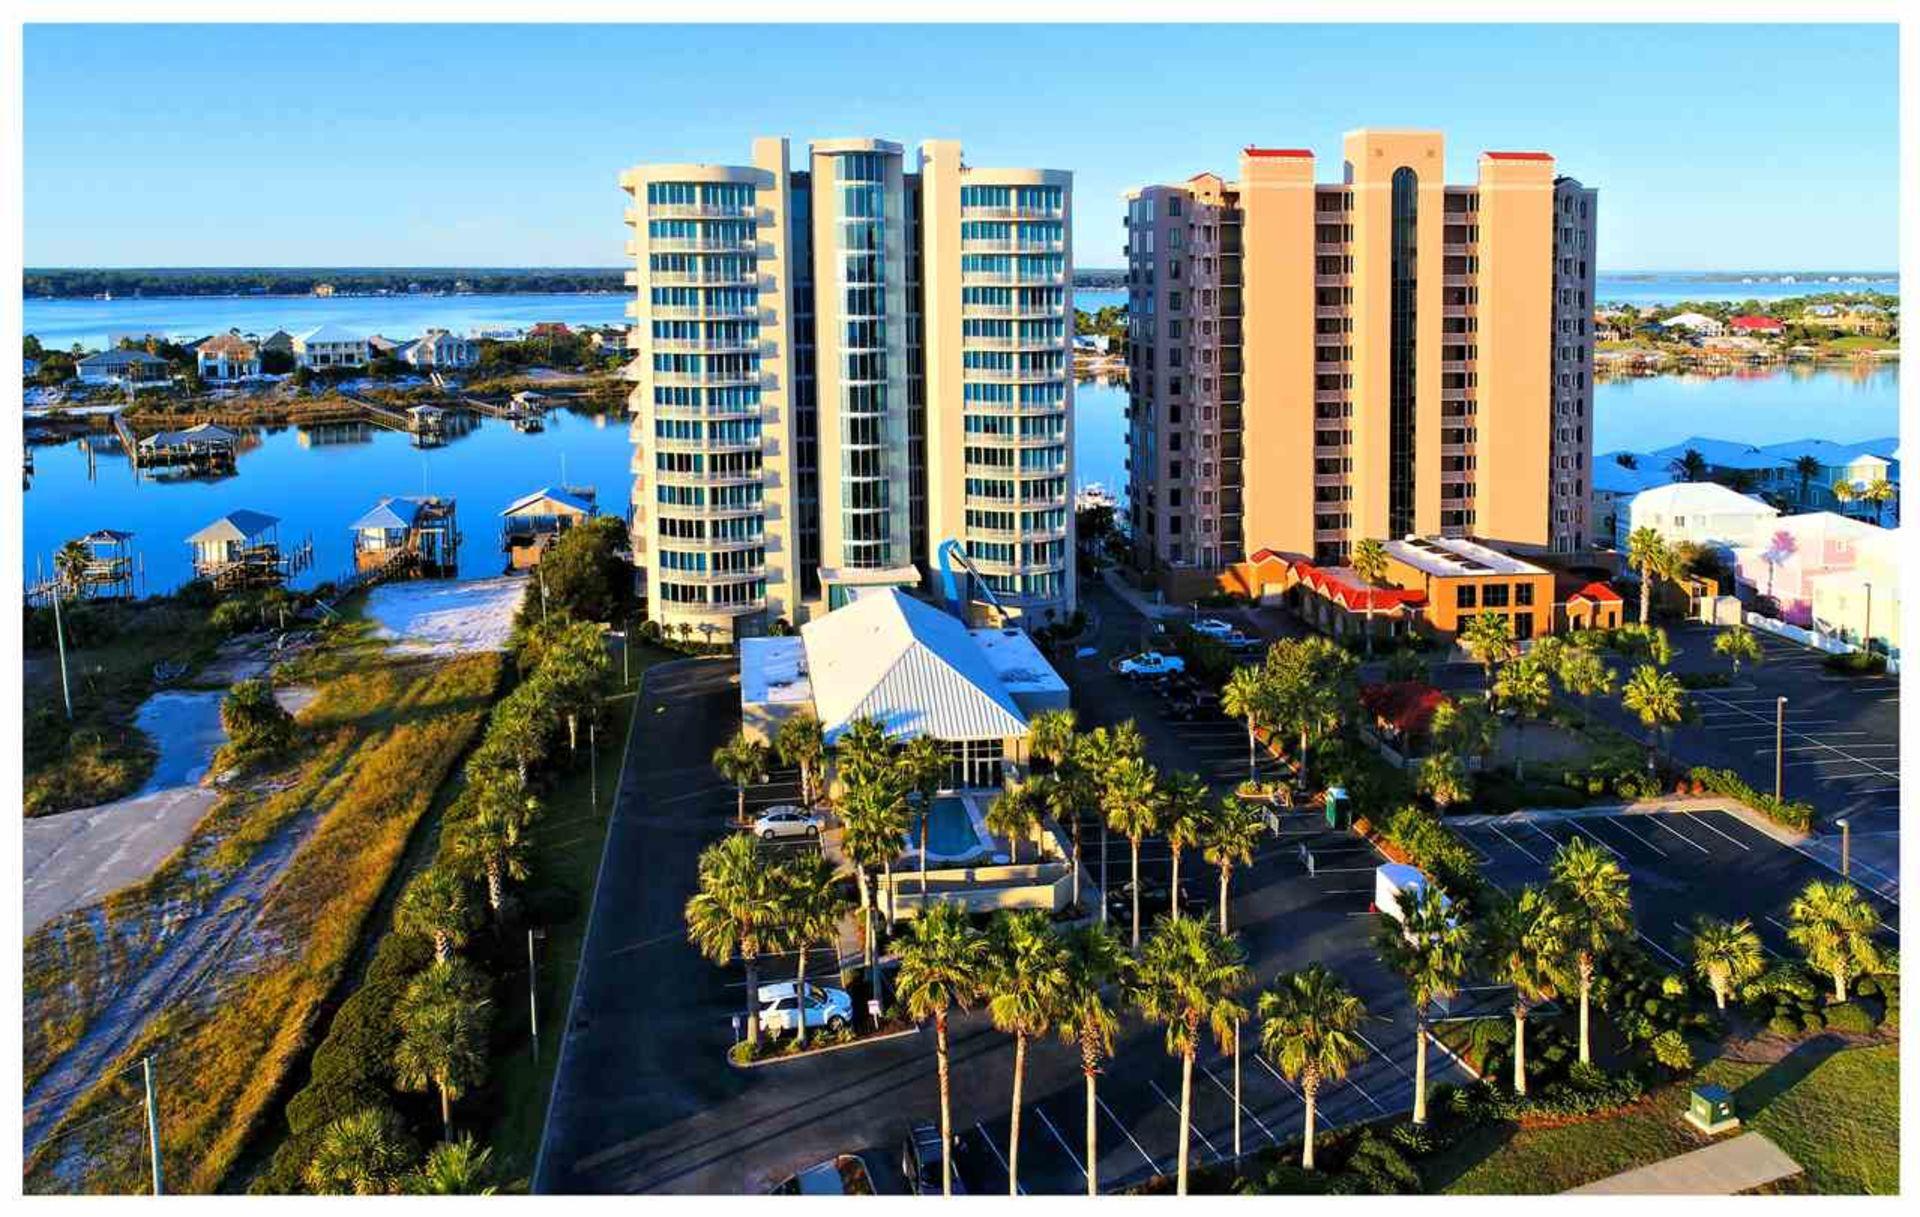 Orange Beach Condos from $600,000 to $1,000,000